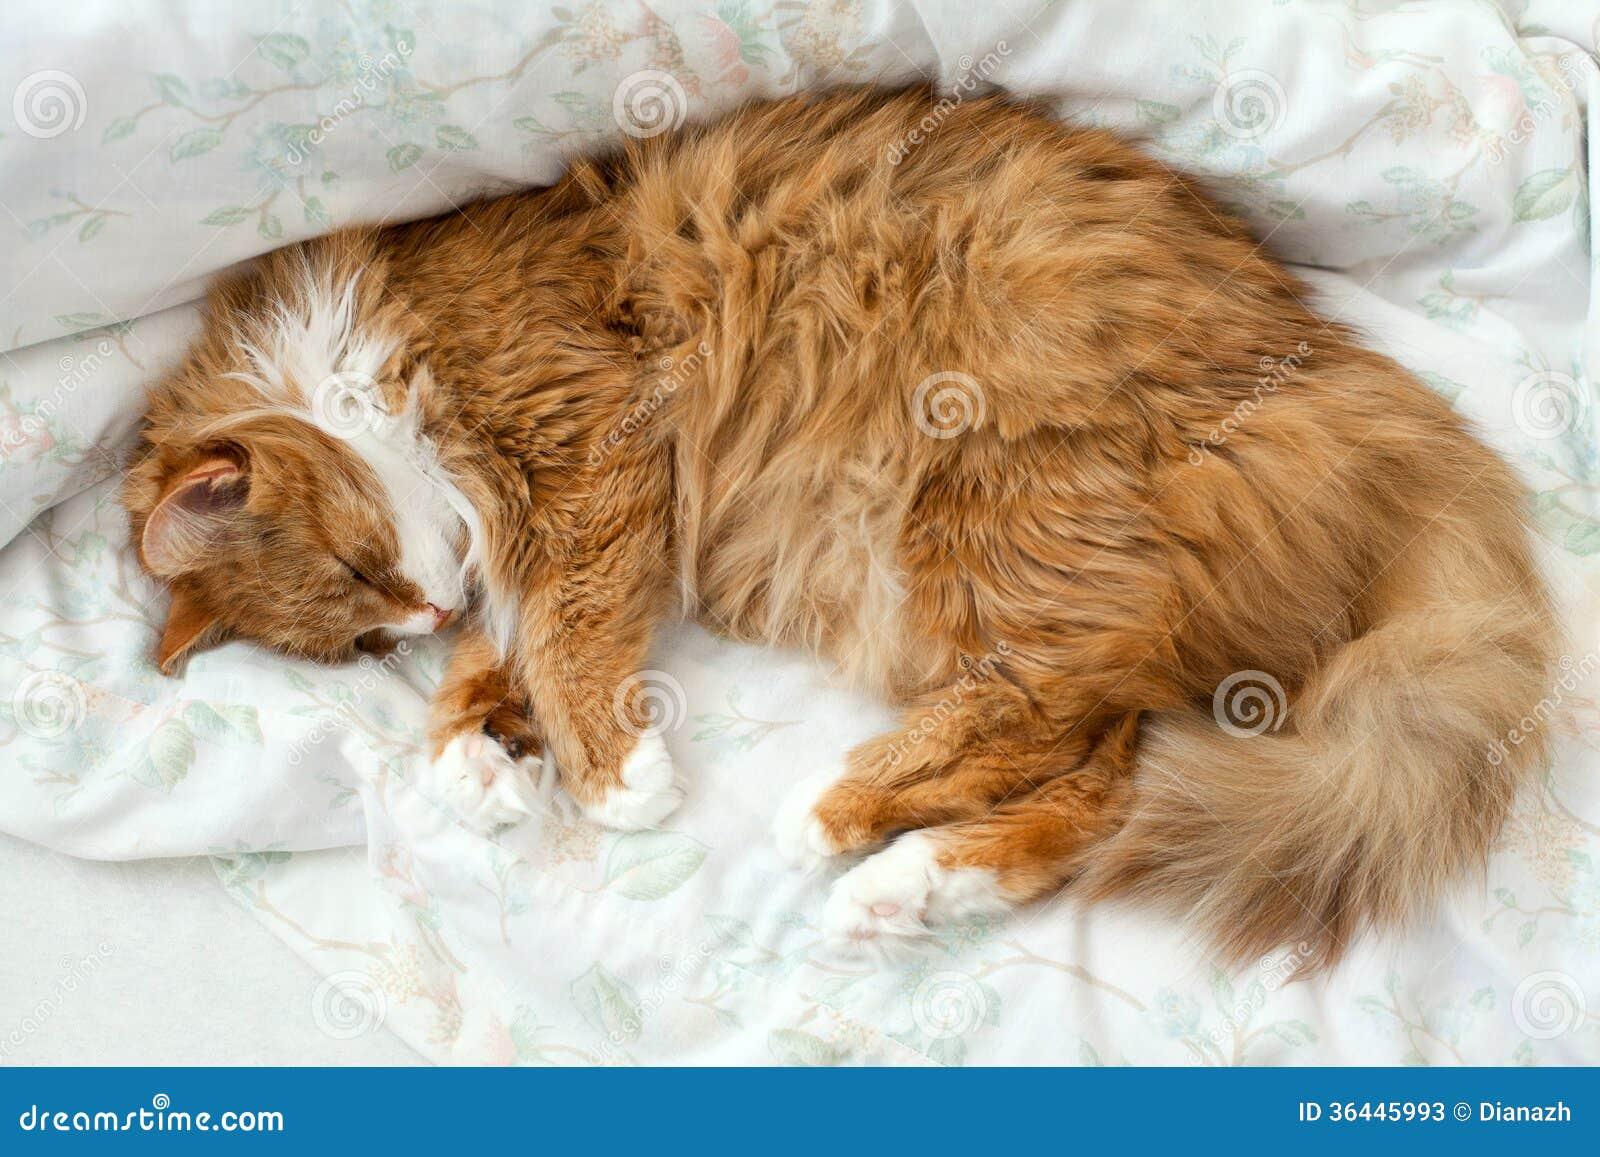 Кот на кровати.картинки